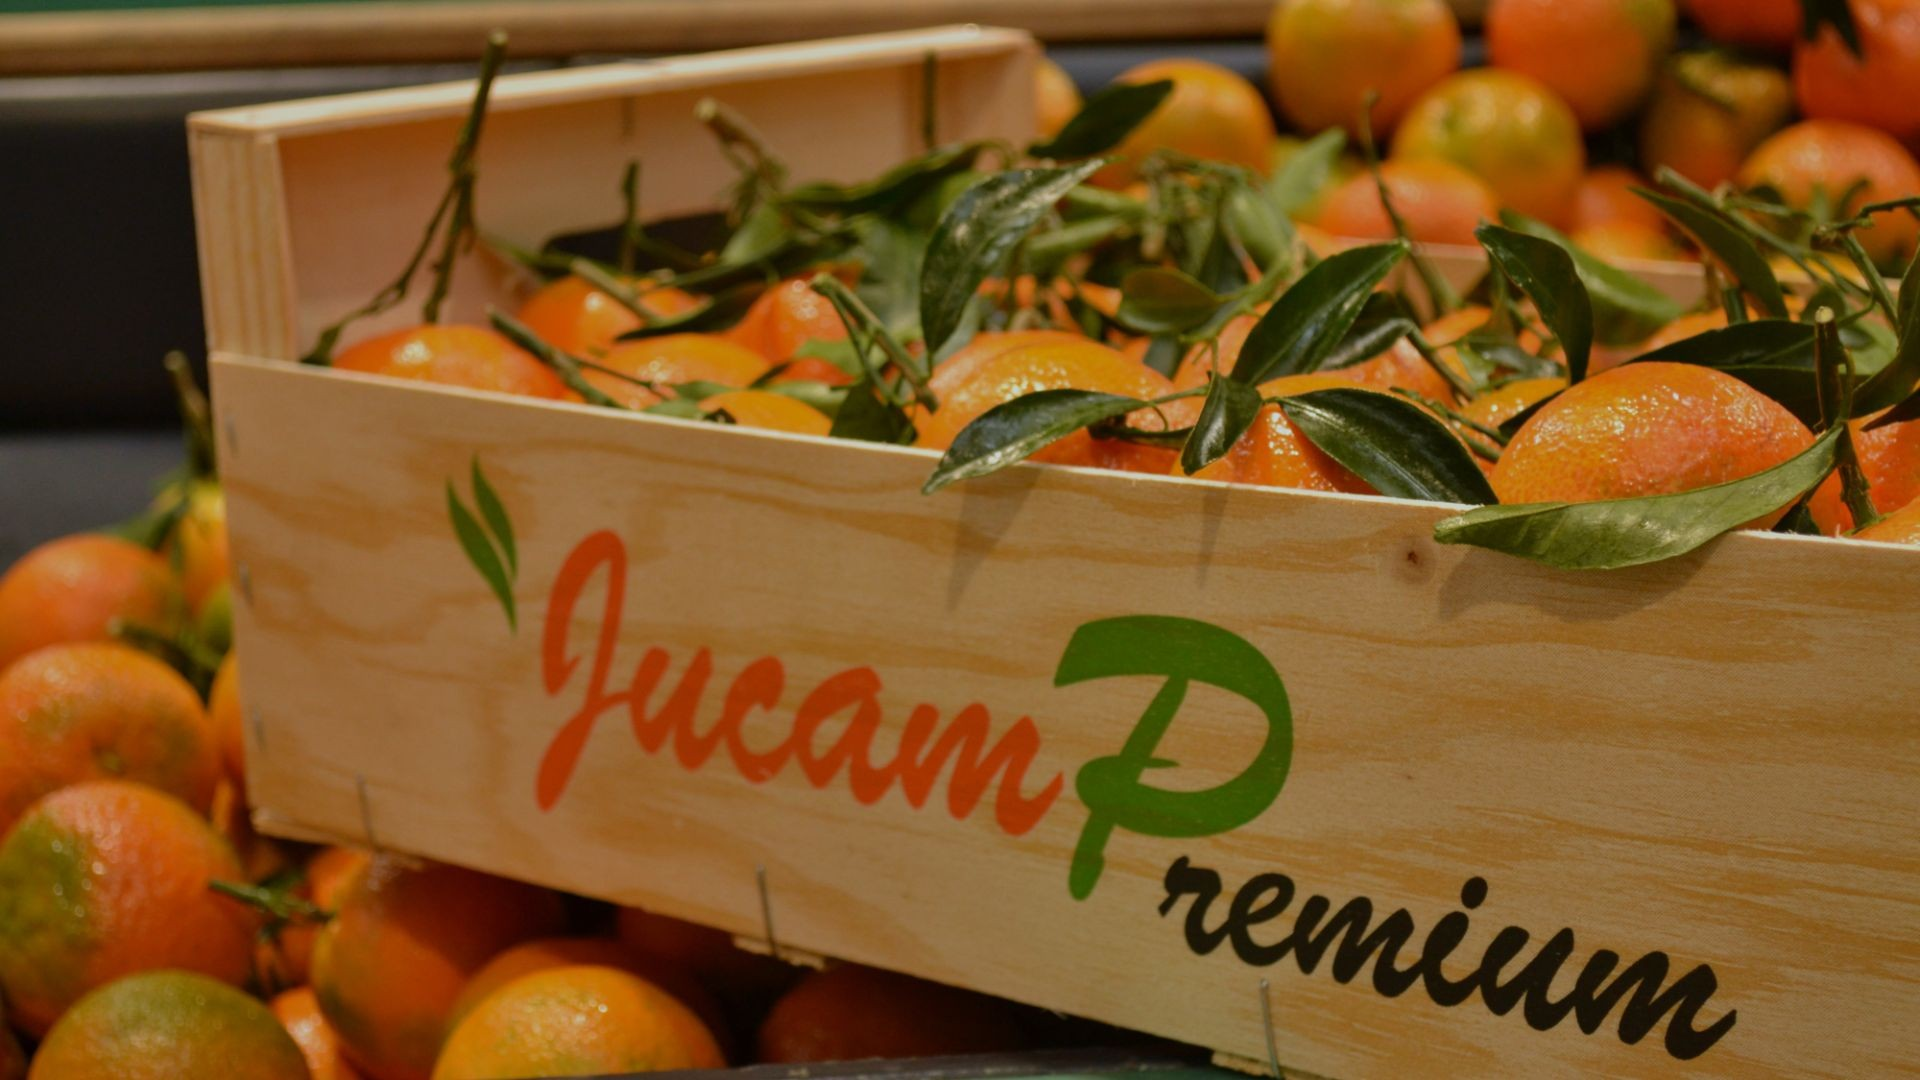 Jucamp Premium